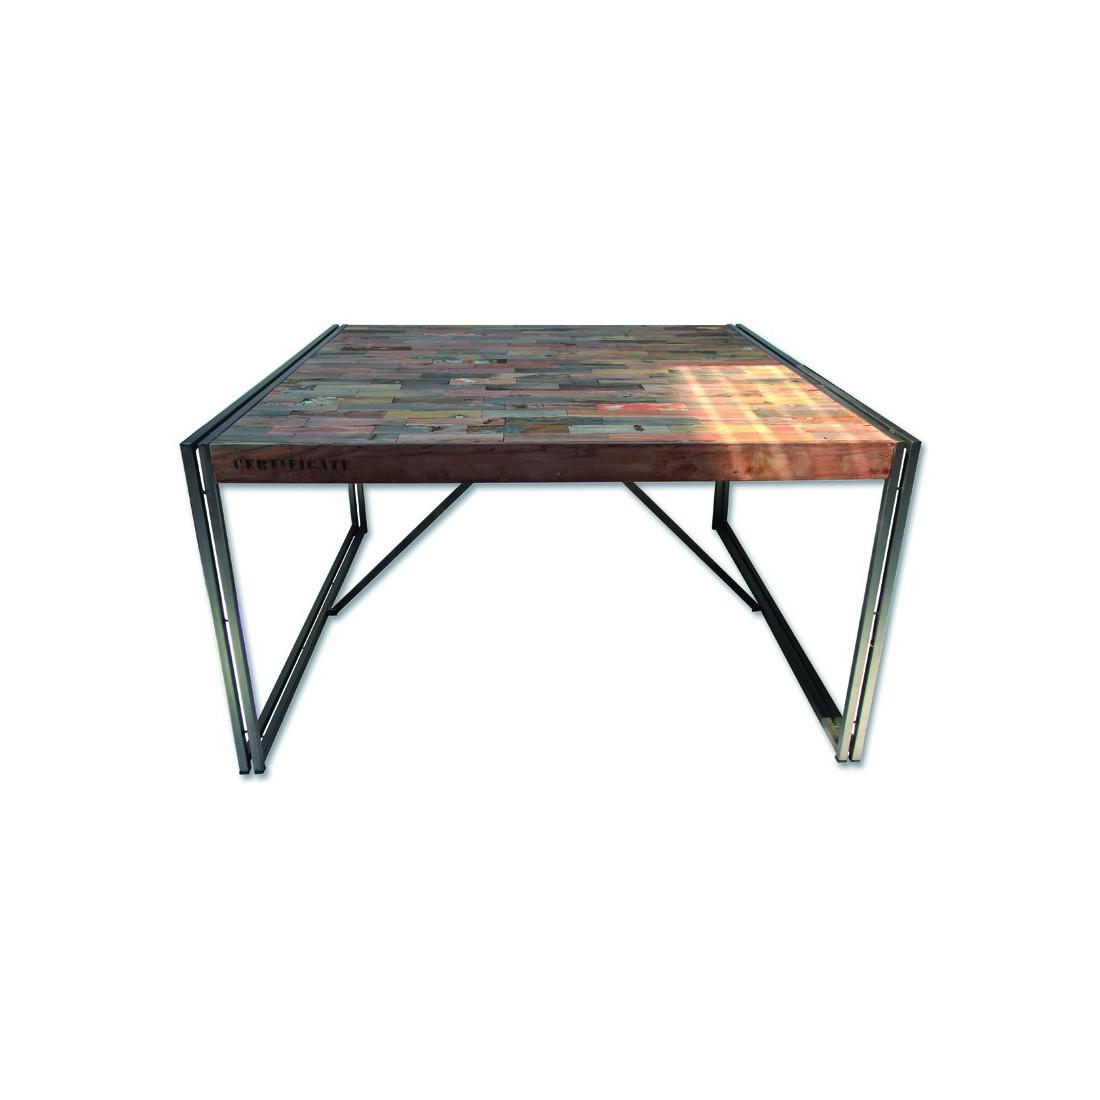 Table a manger 140 cm table salle a manger cm table salle for Table salle a manger 140 cm